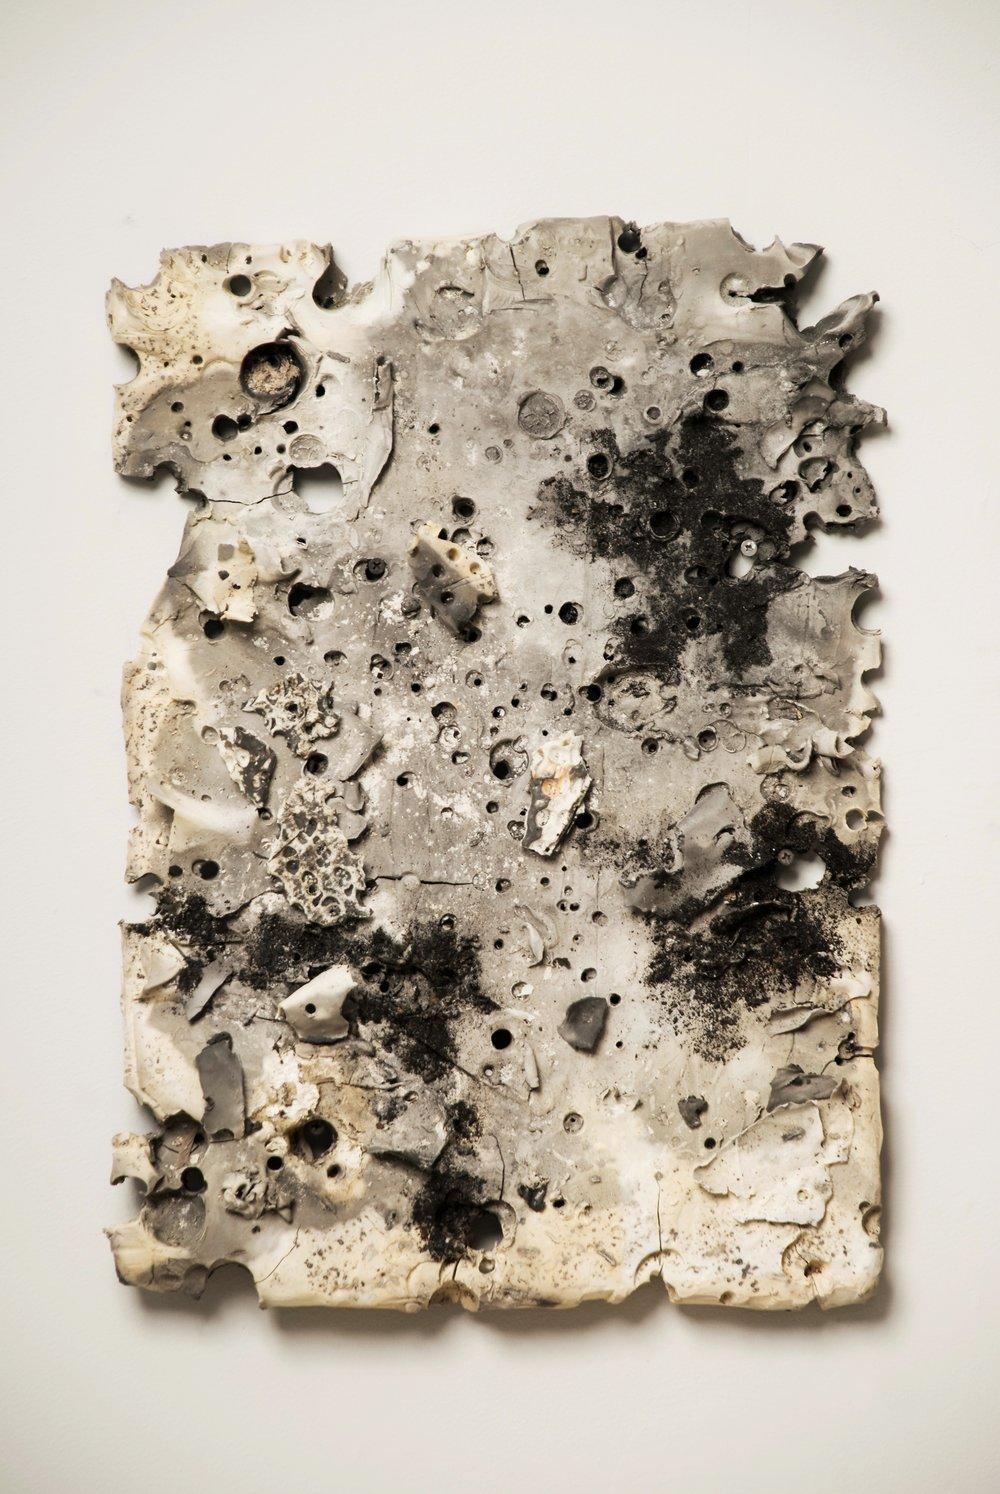 #19 by Clay Art Center Artist Tomoko Abe